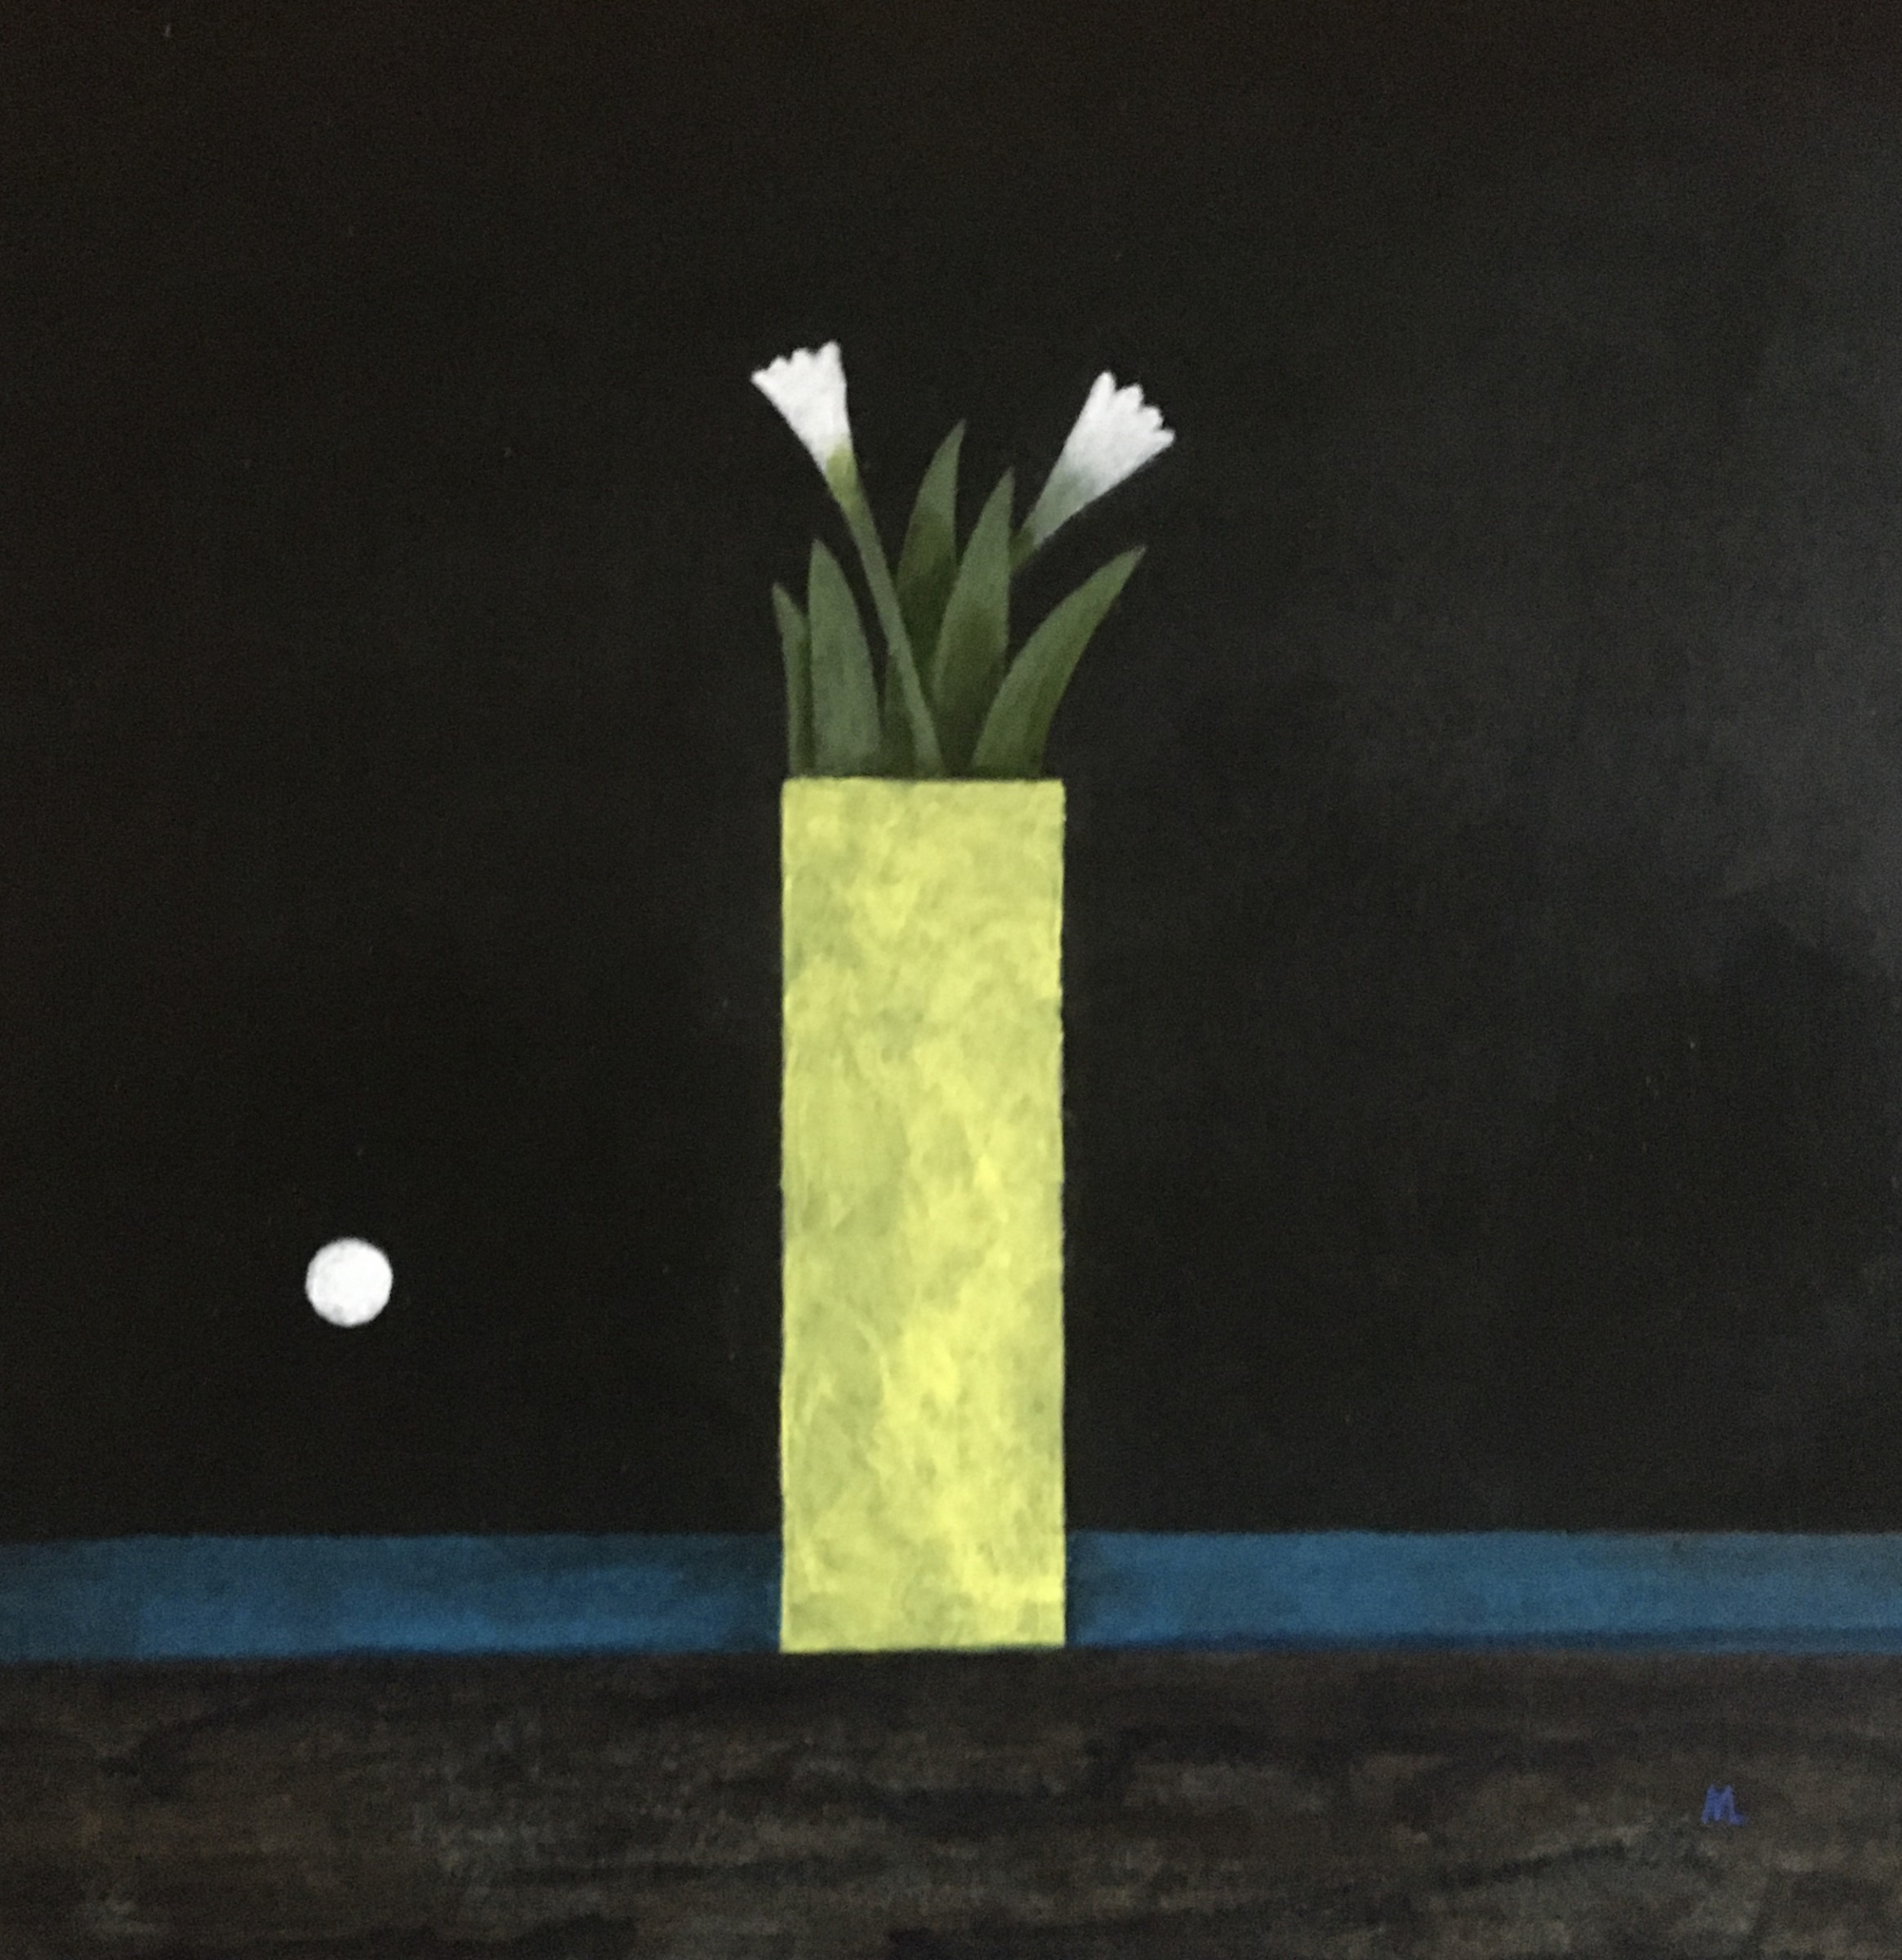 "<span class=""link fancybox-details-link""><a href=""/artists/78-martin-leman/works/12402-martin-leman-evening-flowers/"">View Detail Page</a></span><div class=""artist""><span class=""artist""><strong>Martin Leman</strong></span></div><div class=""title""><em>Evening Flowers</em></div><div class=""medium"">acrylic on card</div><div class=""dimensions"">Frame: 54 x 54 cm<br /> Artwork: 40 x 49 cm</div><div class=""price"">£1,200.00</div>"